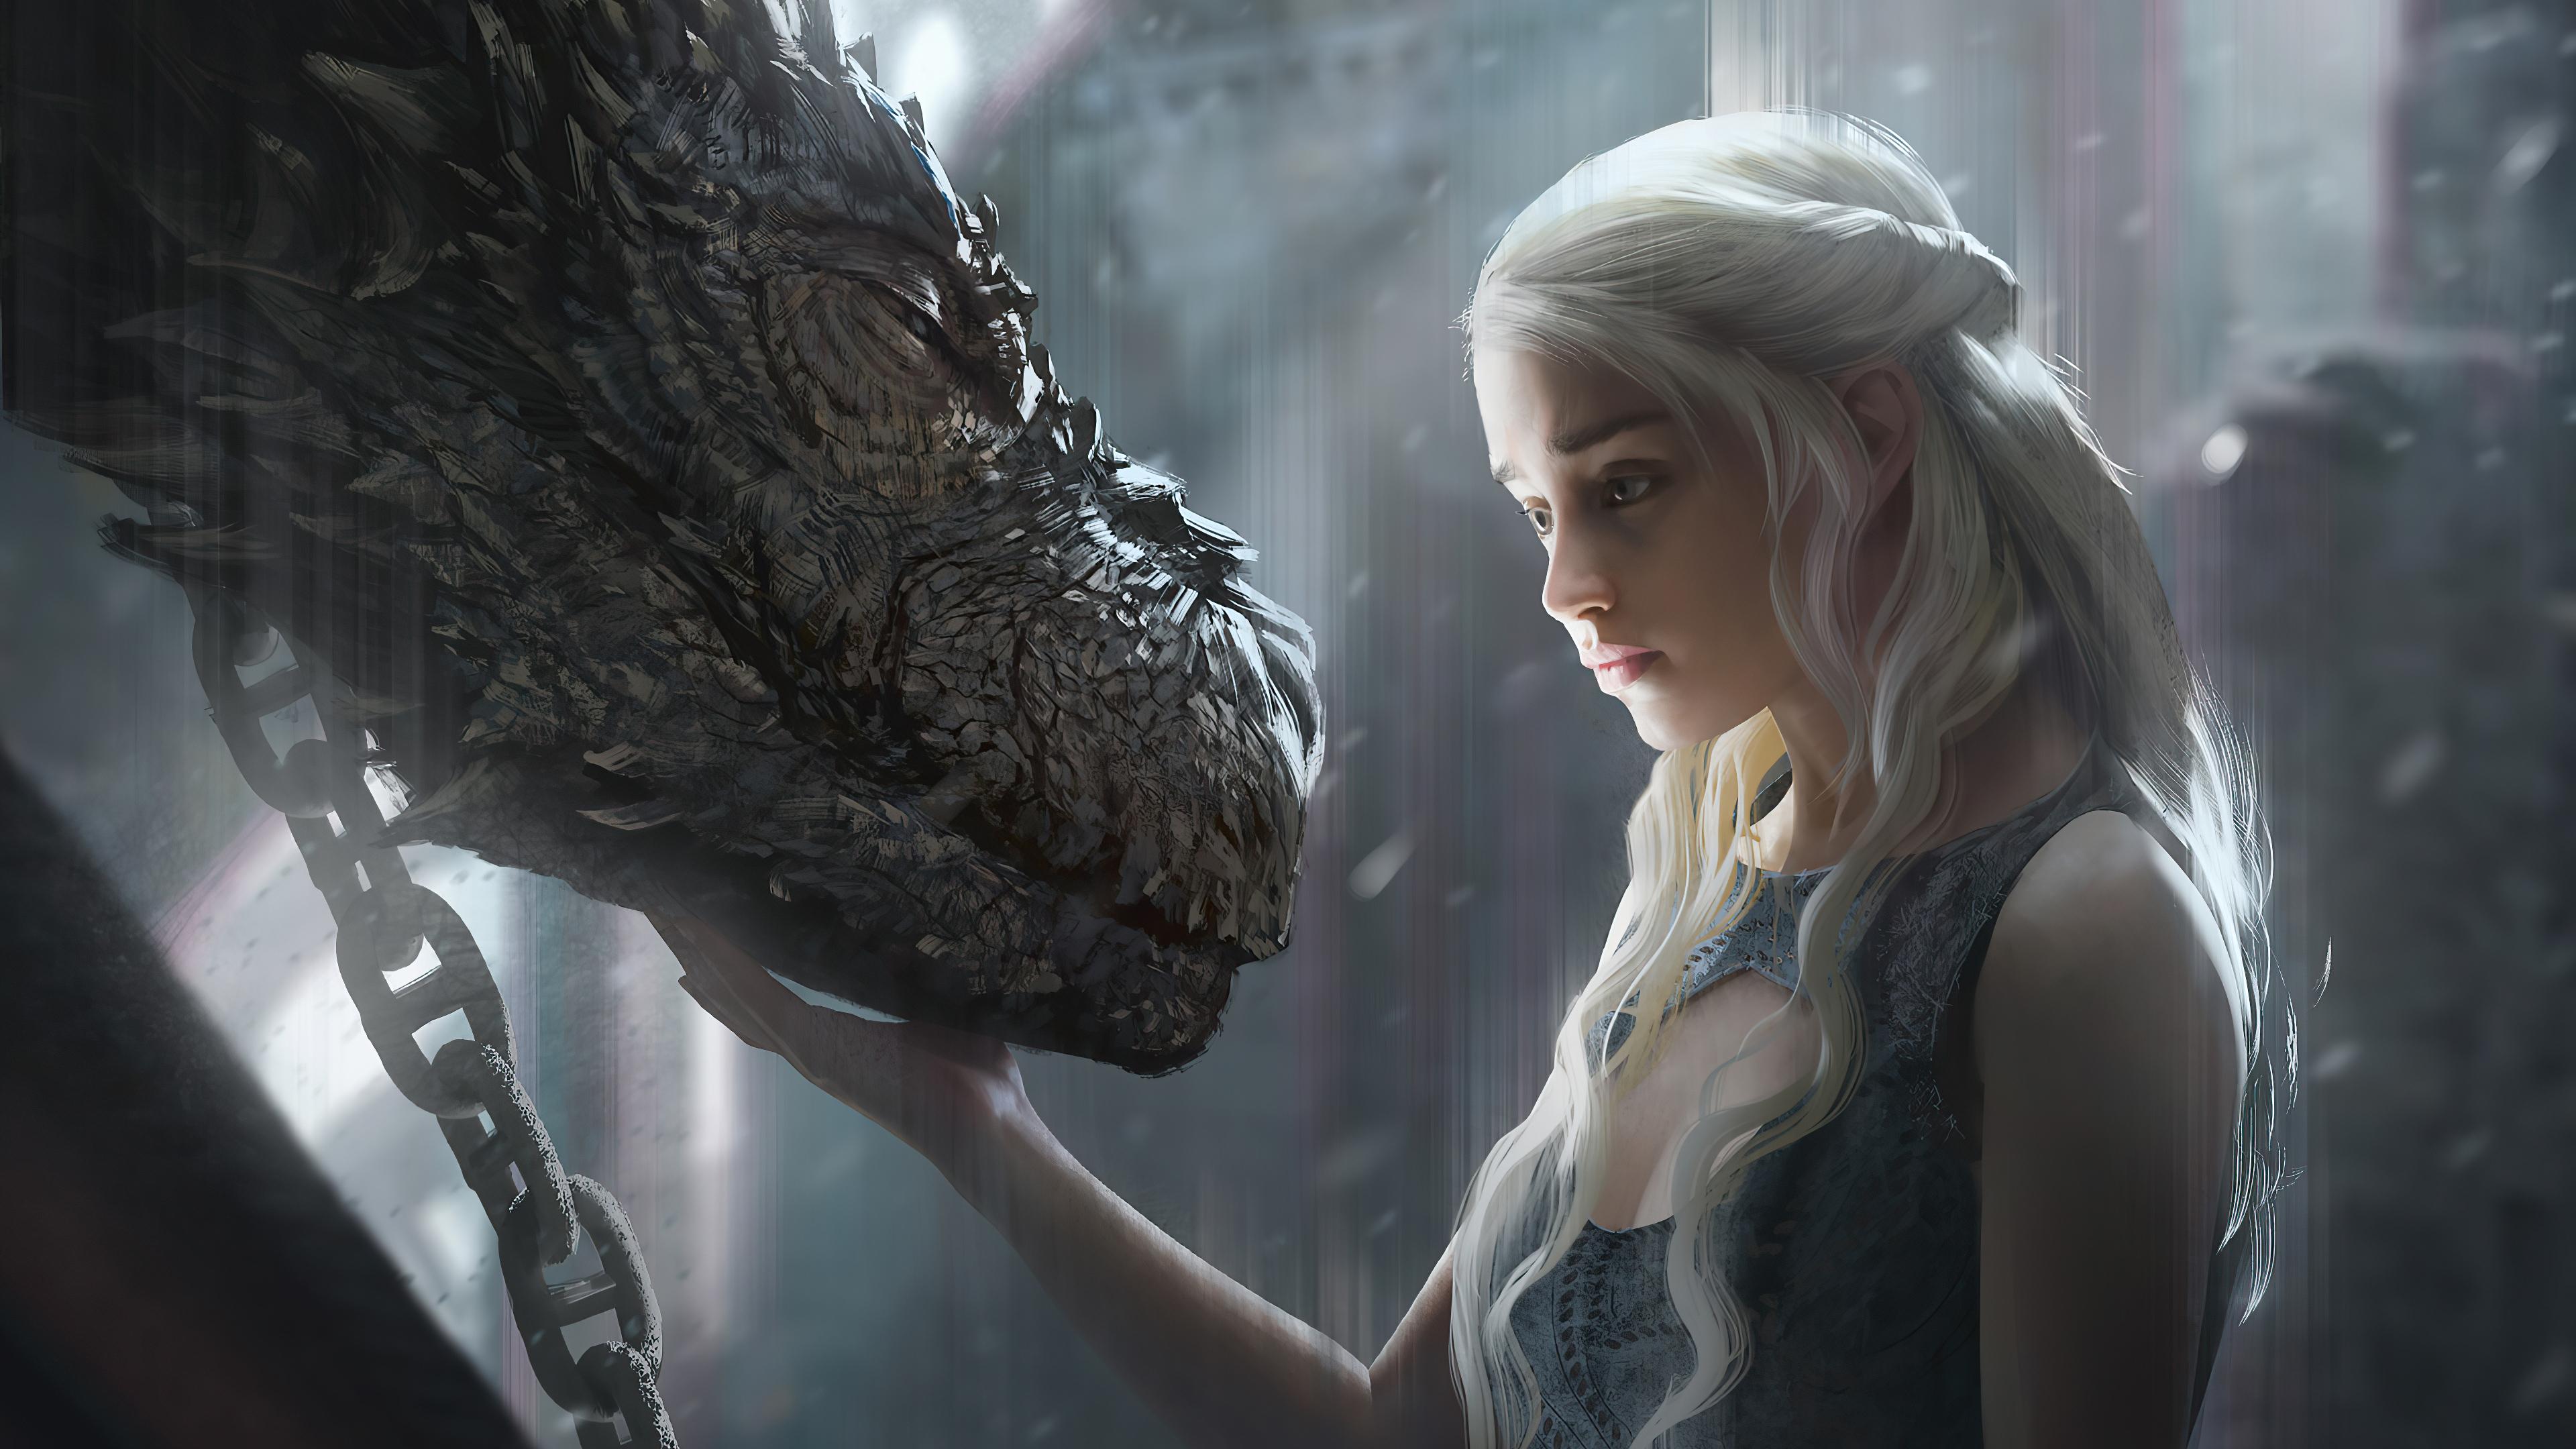 dragon and daenerys targayen 4k 1602452335 - Dragon And Daenerys Targayen 4k - Dragon And Daenerys Targayen 4k wallpapers